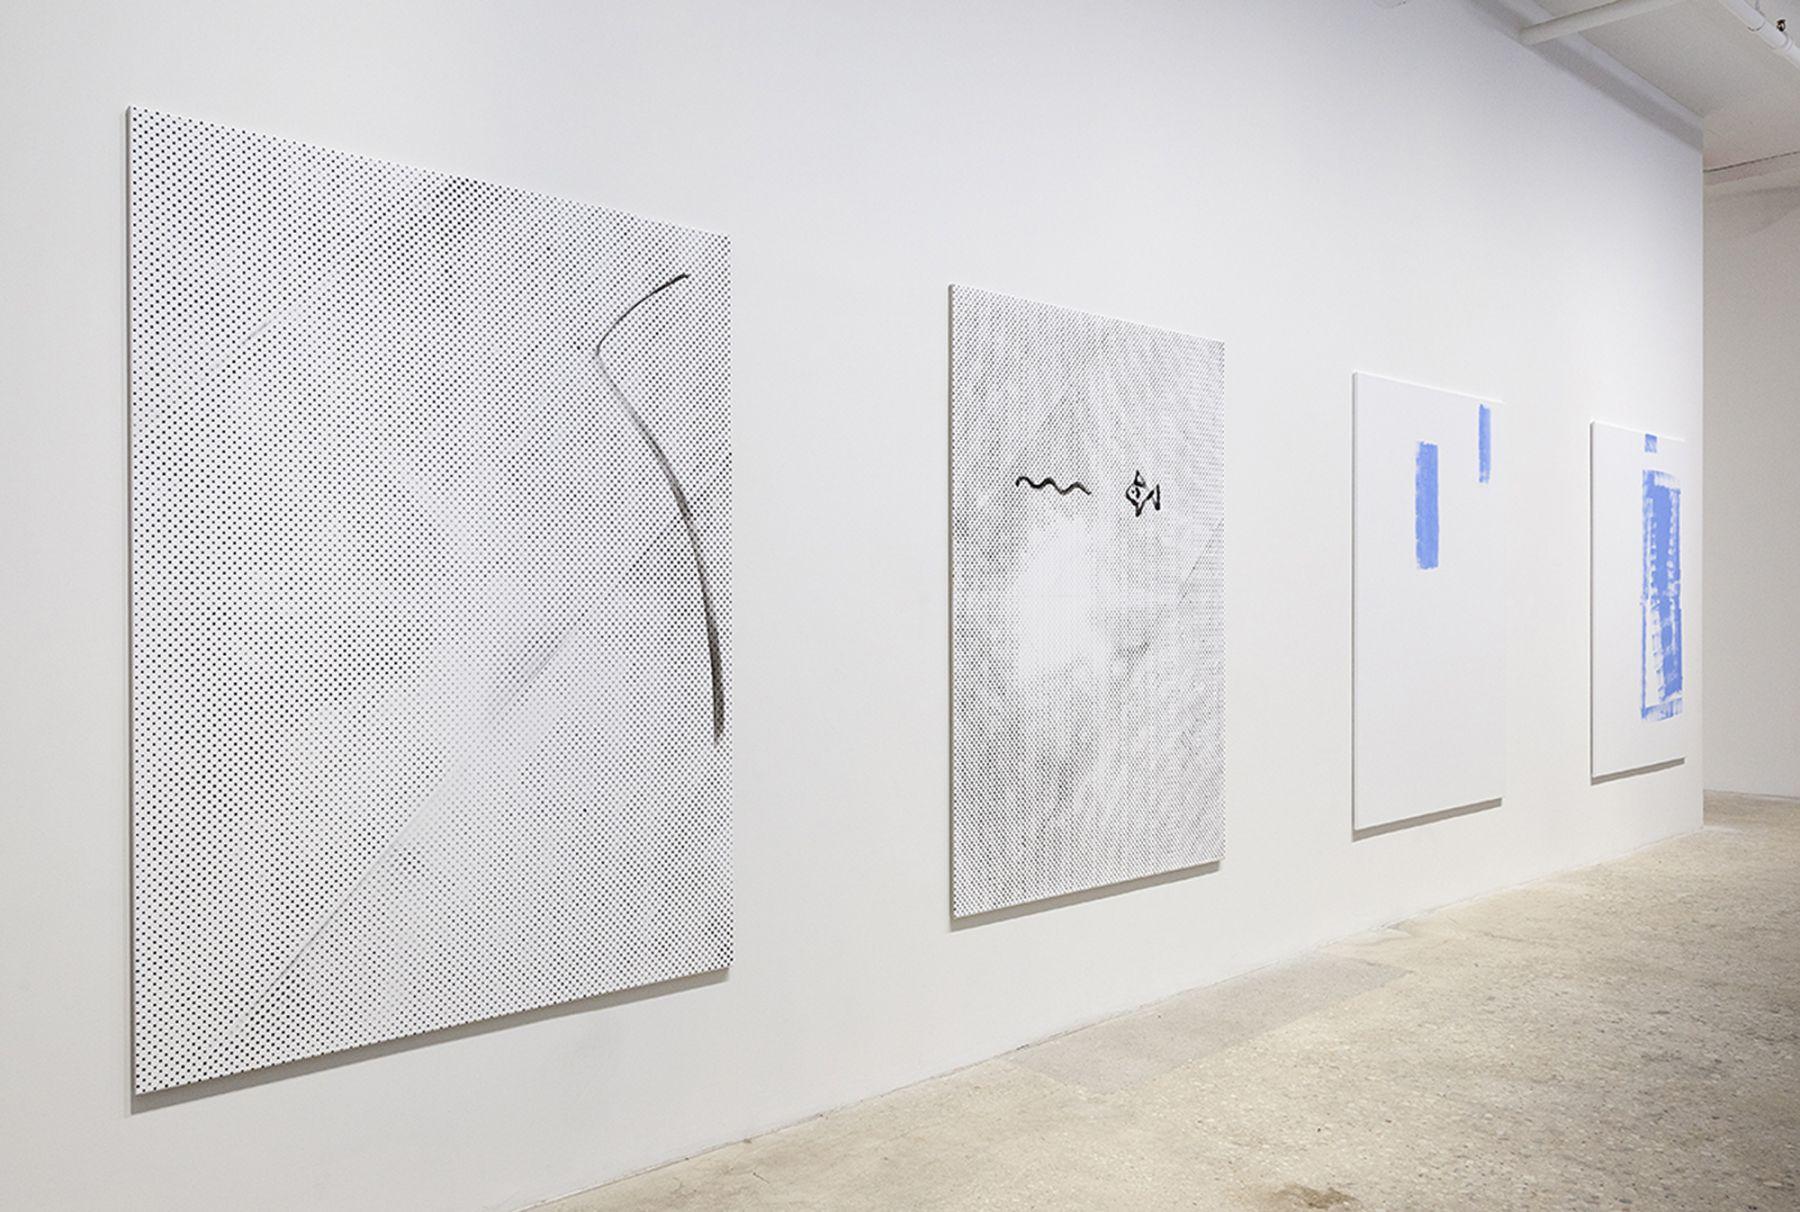 Michael Krebber, Installation View, Ground Floor, Greene Naftali, New York, 2015